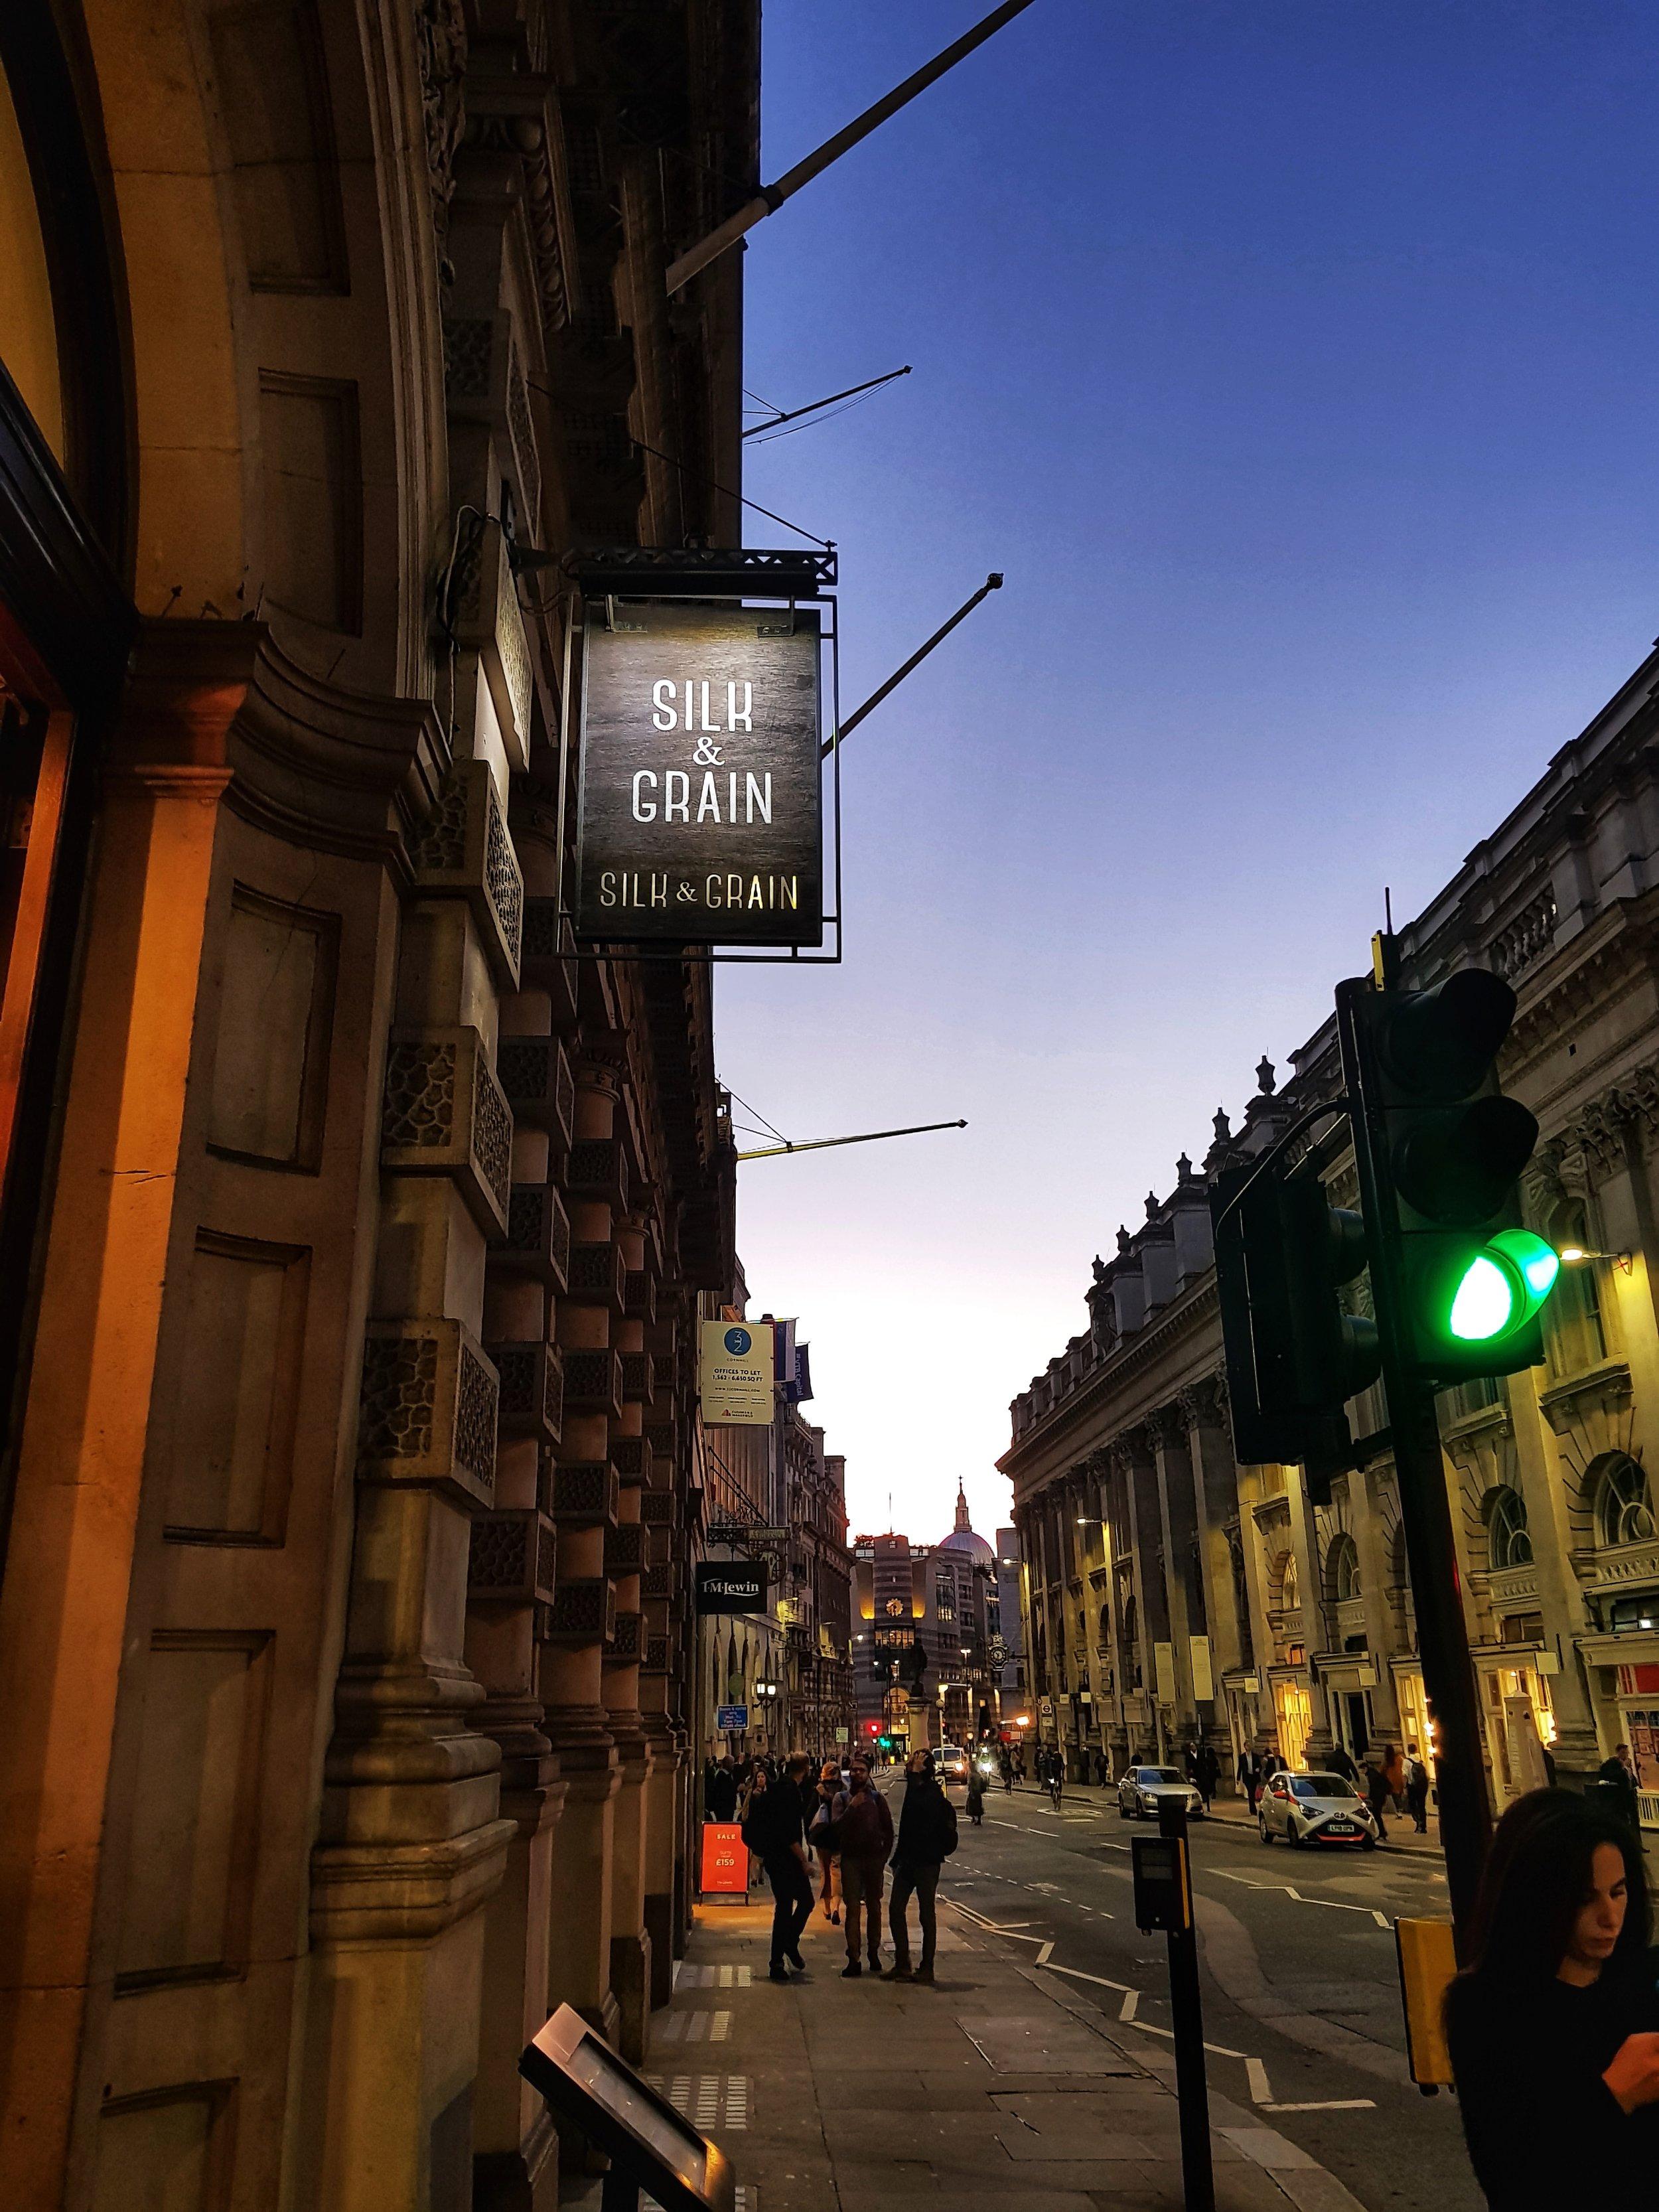 SILK AND GRAIN LONDON RESTAURANT REVIEW